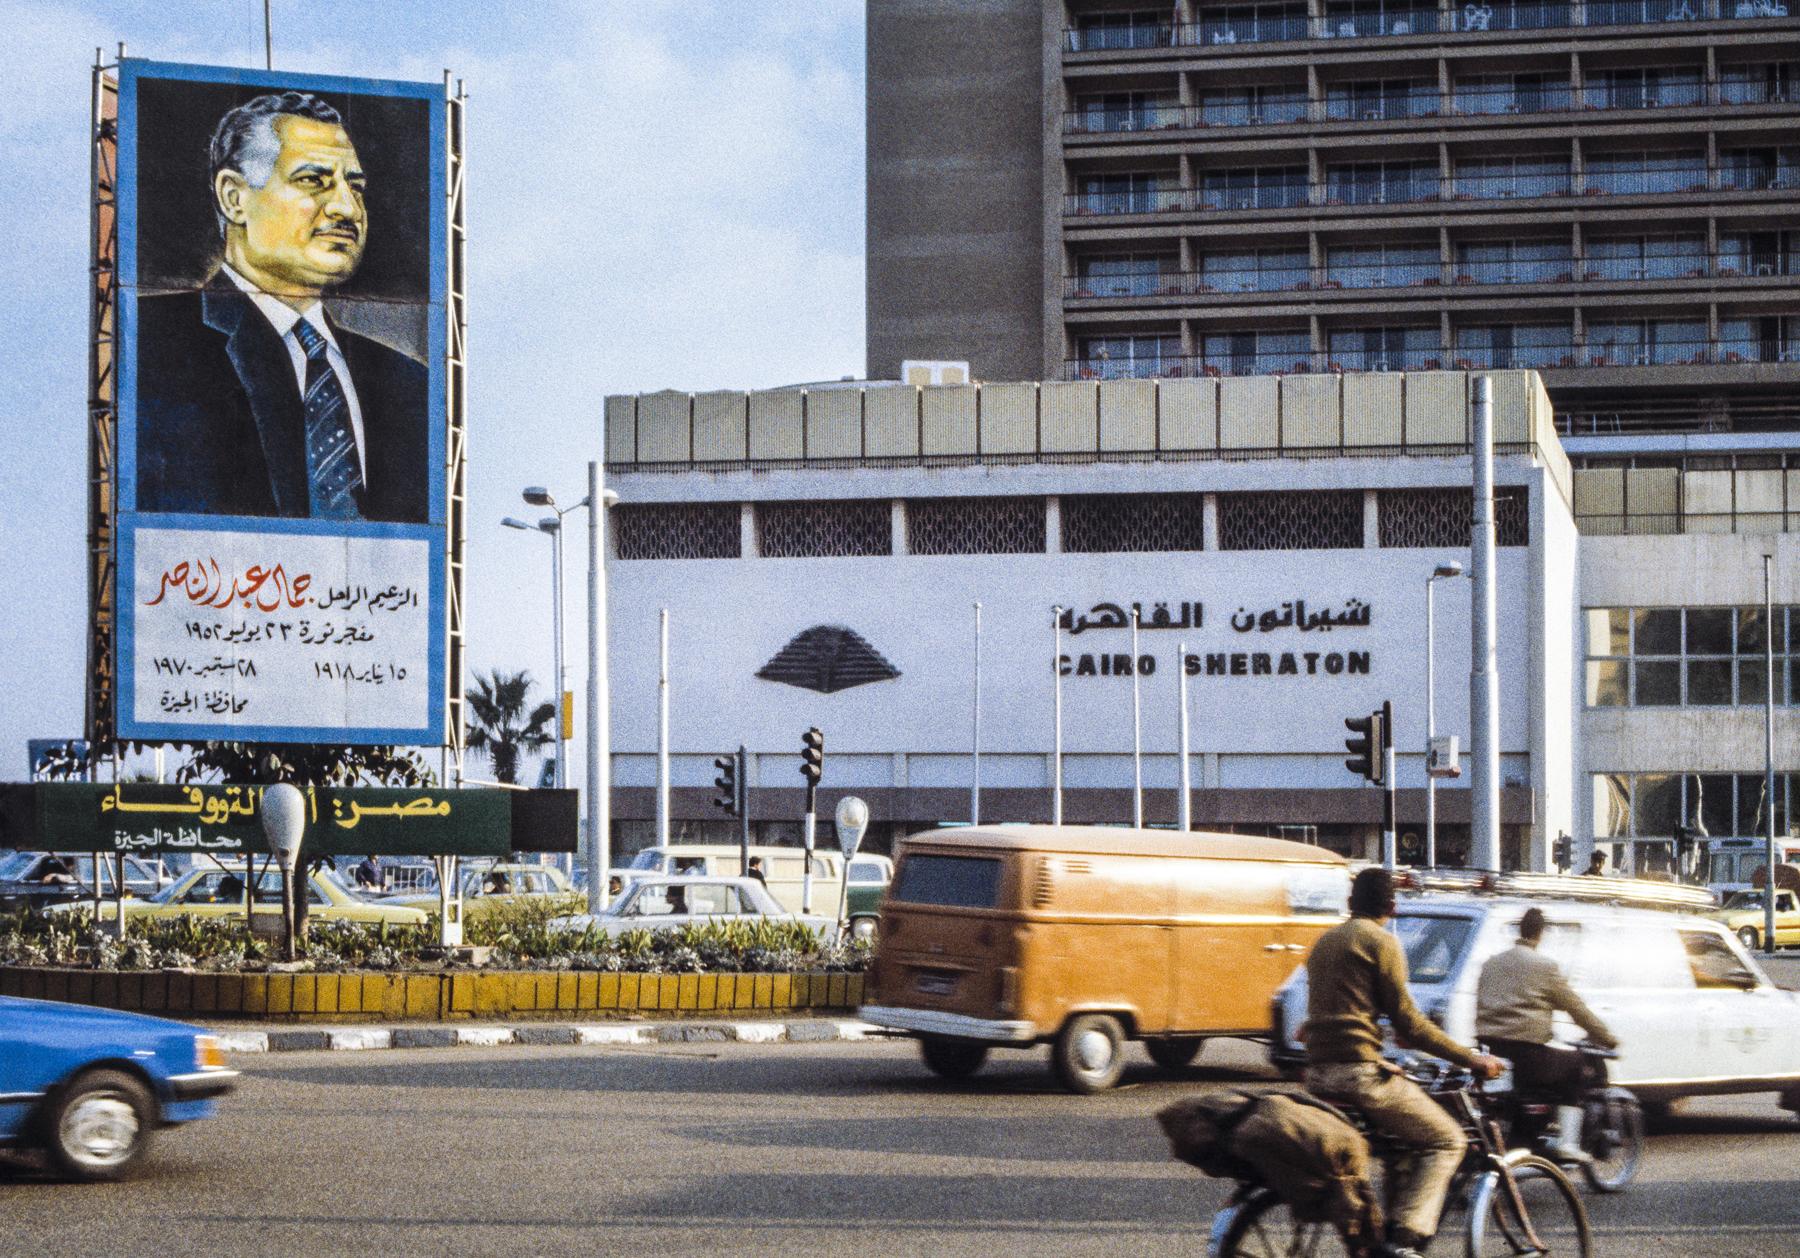 Lucien Samaha   Nasser at Cairo Sheraton (Cairo Billboards) , 1984, printed 2014 archival pigment print 30 x 44 inches 76.2 x 111.8 cm